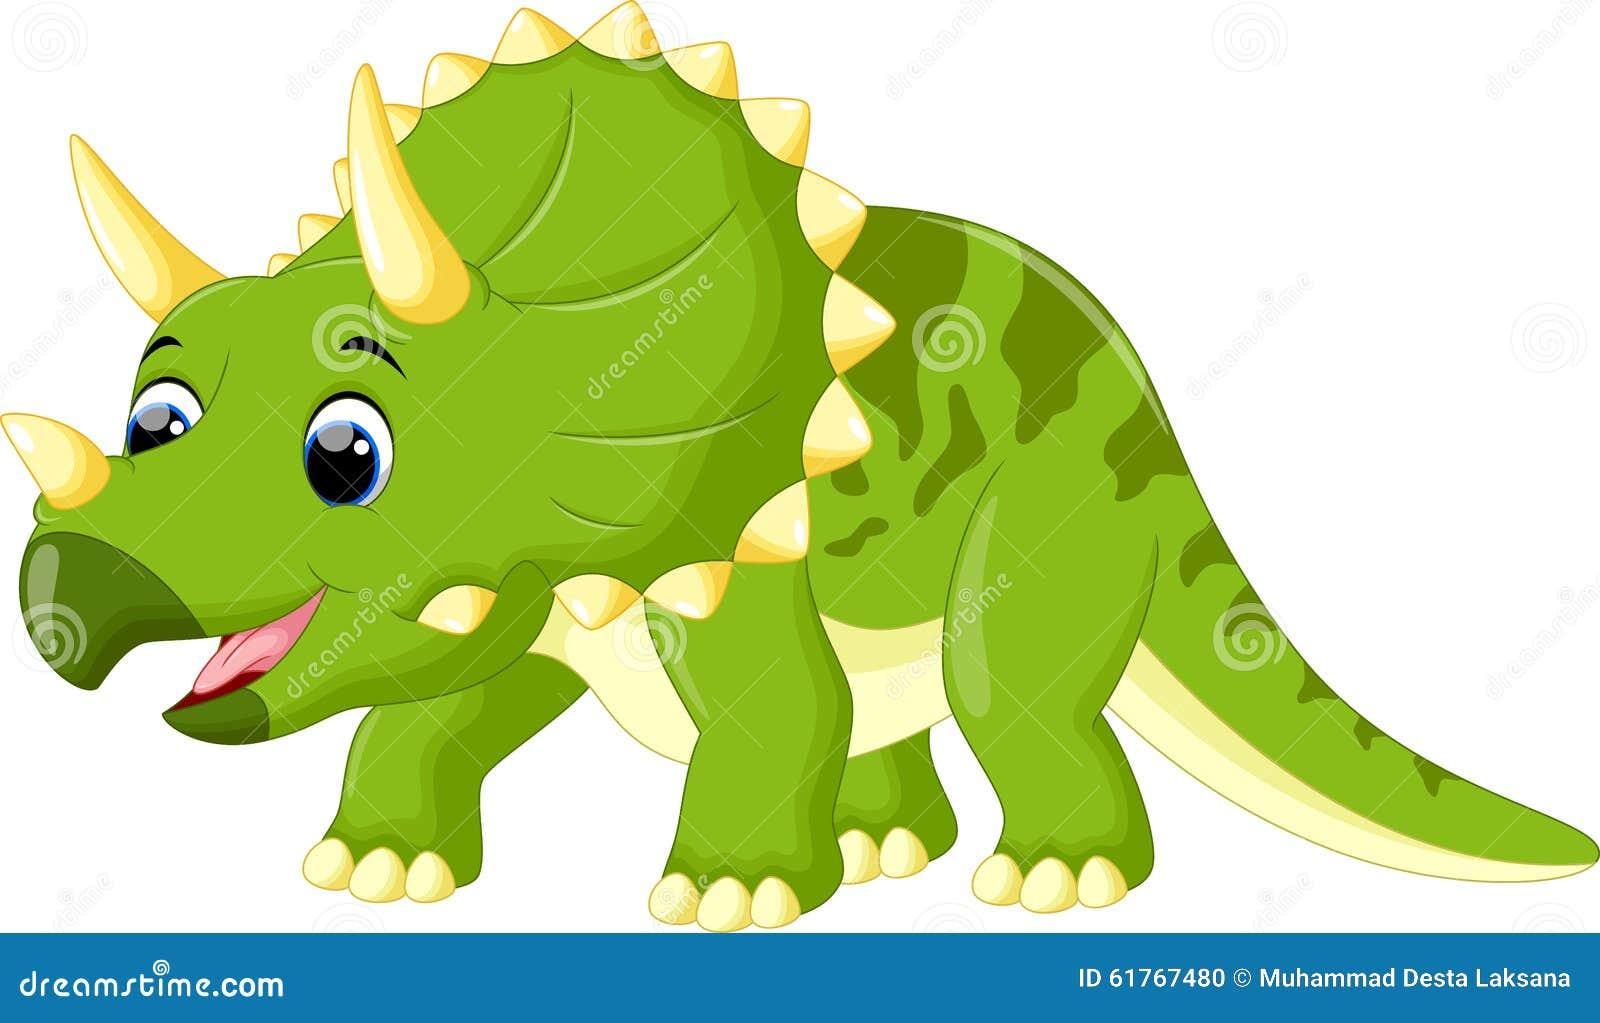 cute triceratops cartoon stock illustration image of